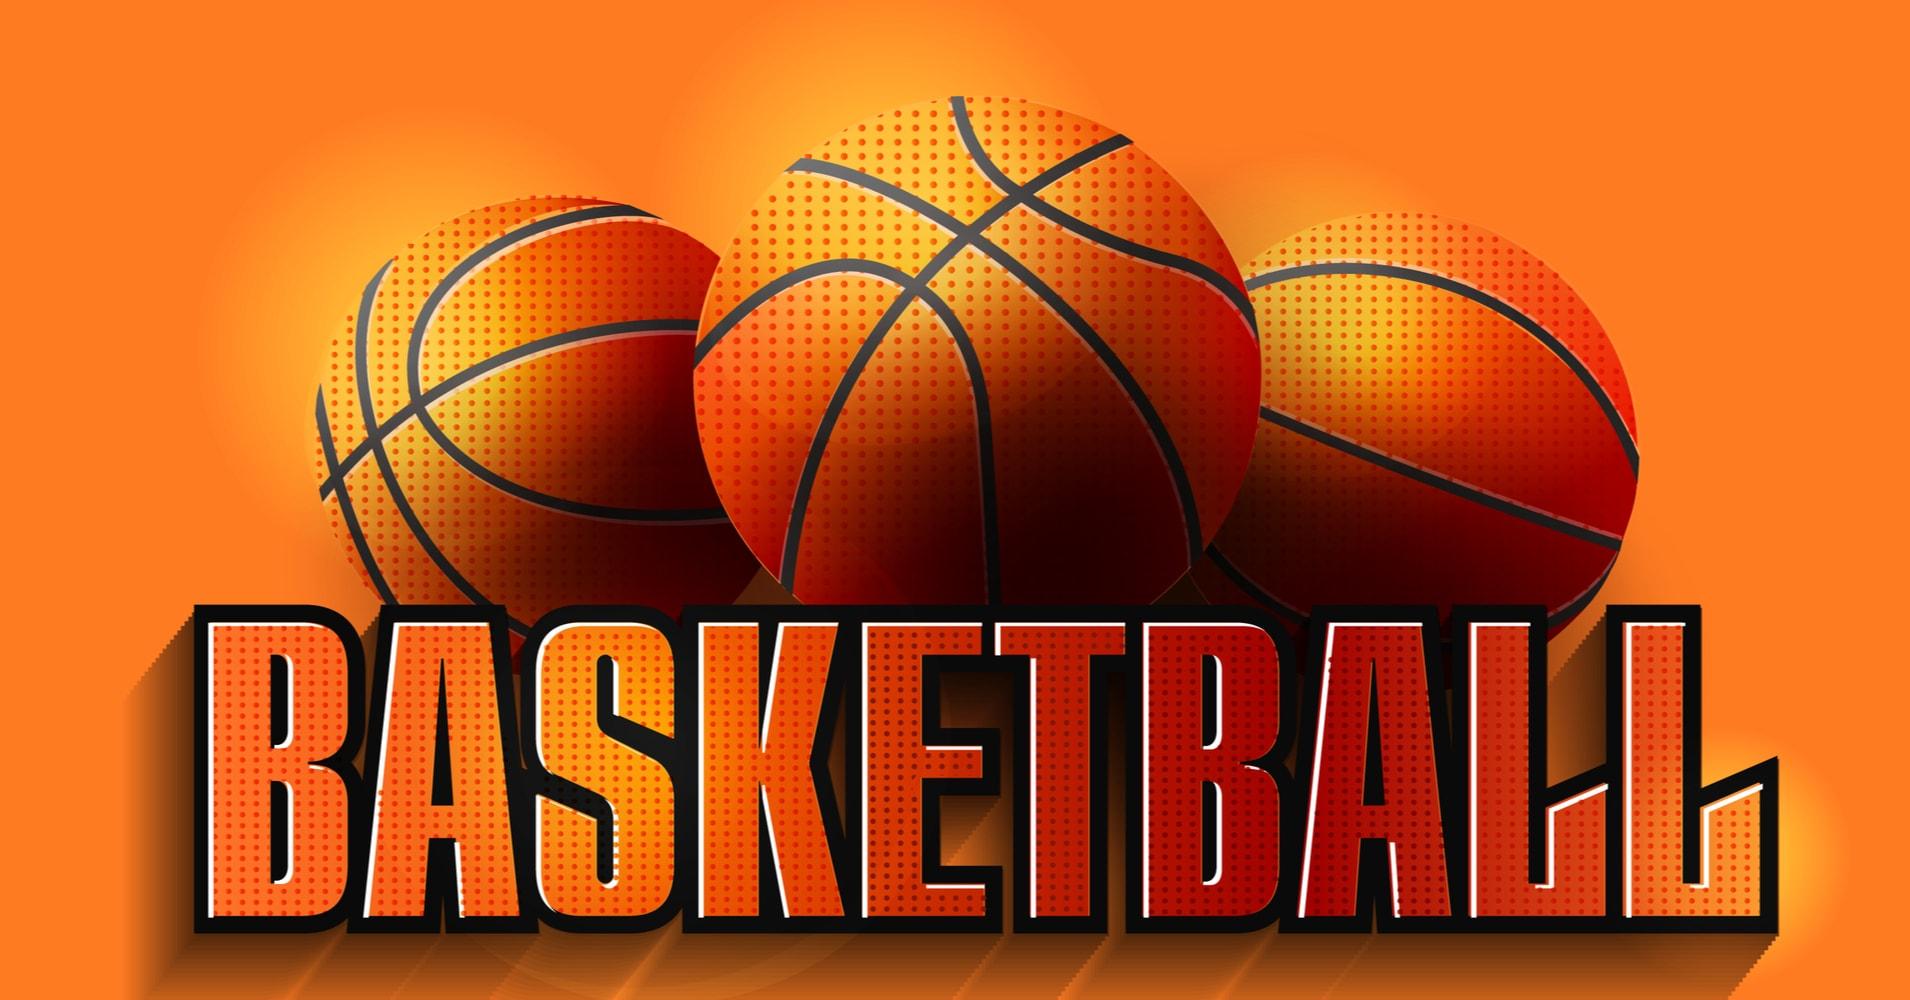 Basketball Jargon